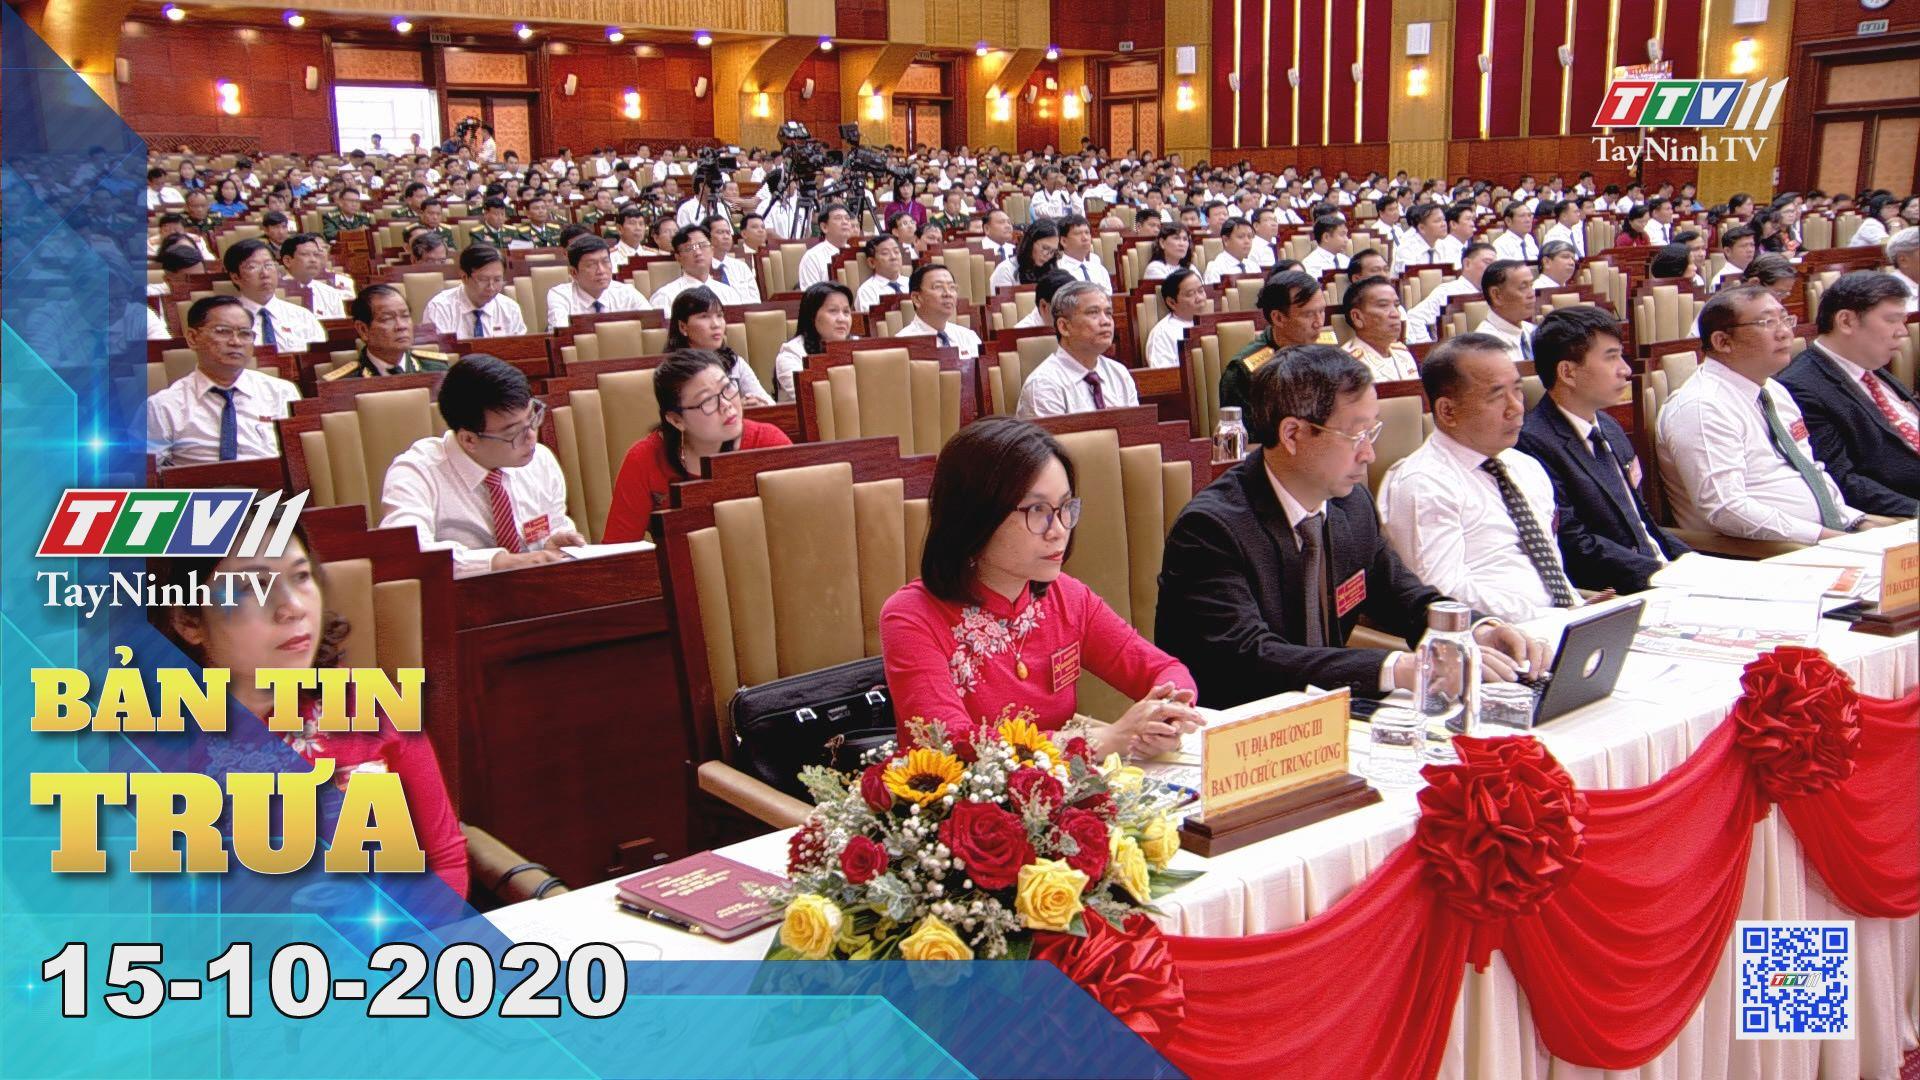 Bản tin trưa 15-10-2020 | Tin tức hôm nay | TayNinhTV